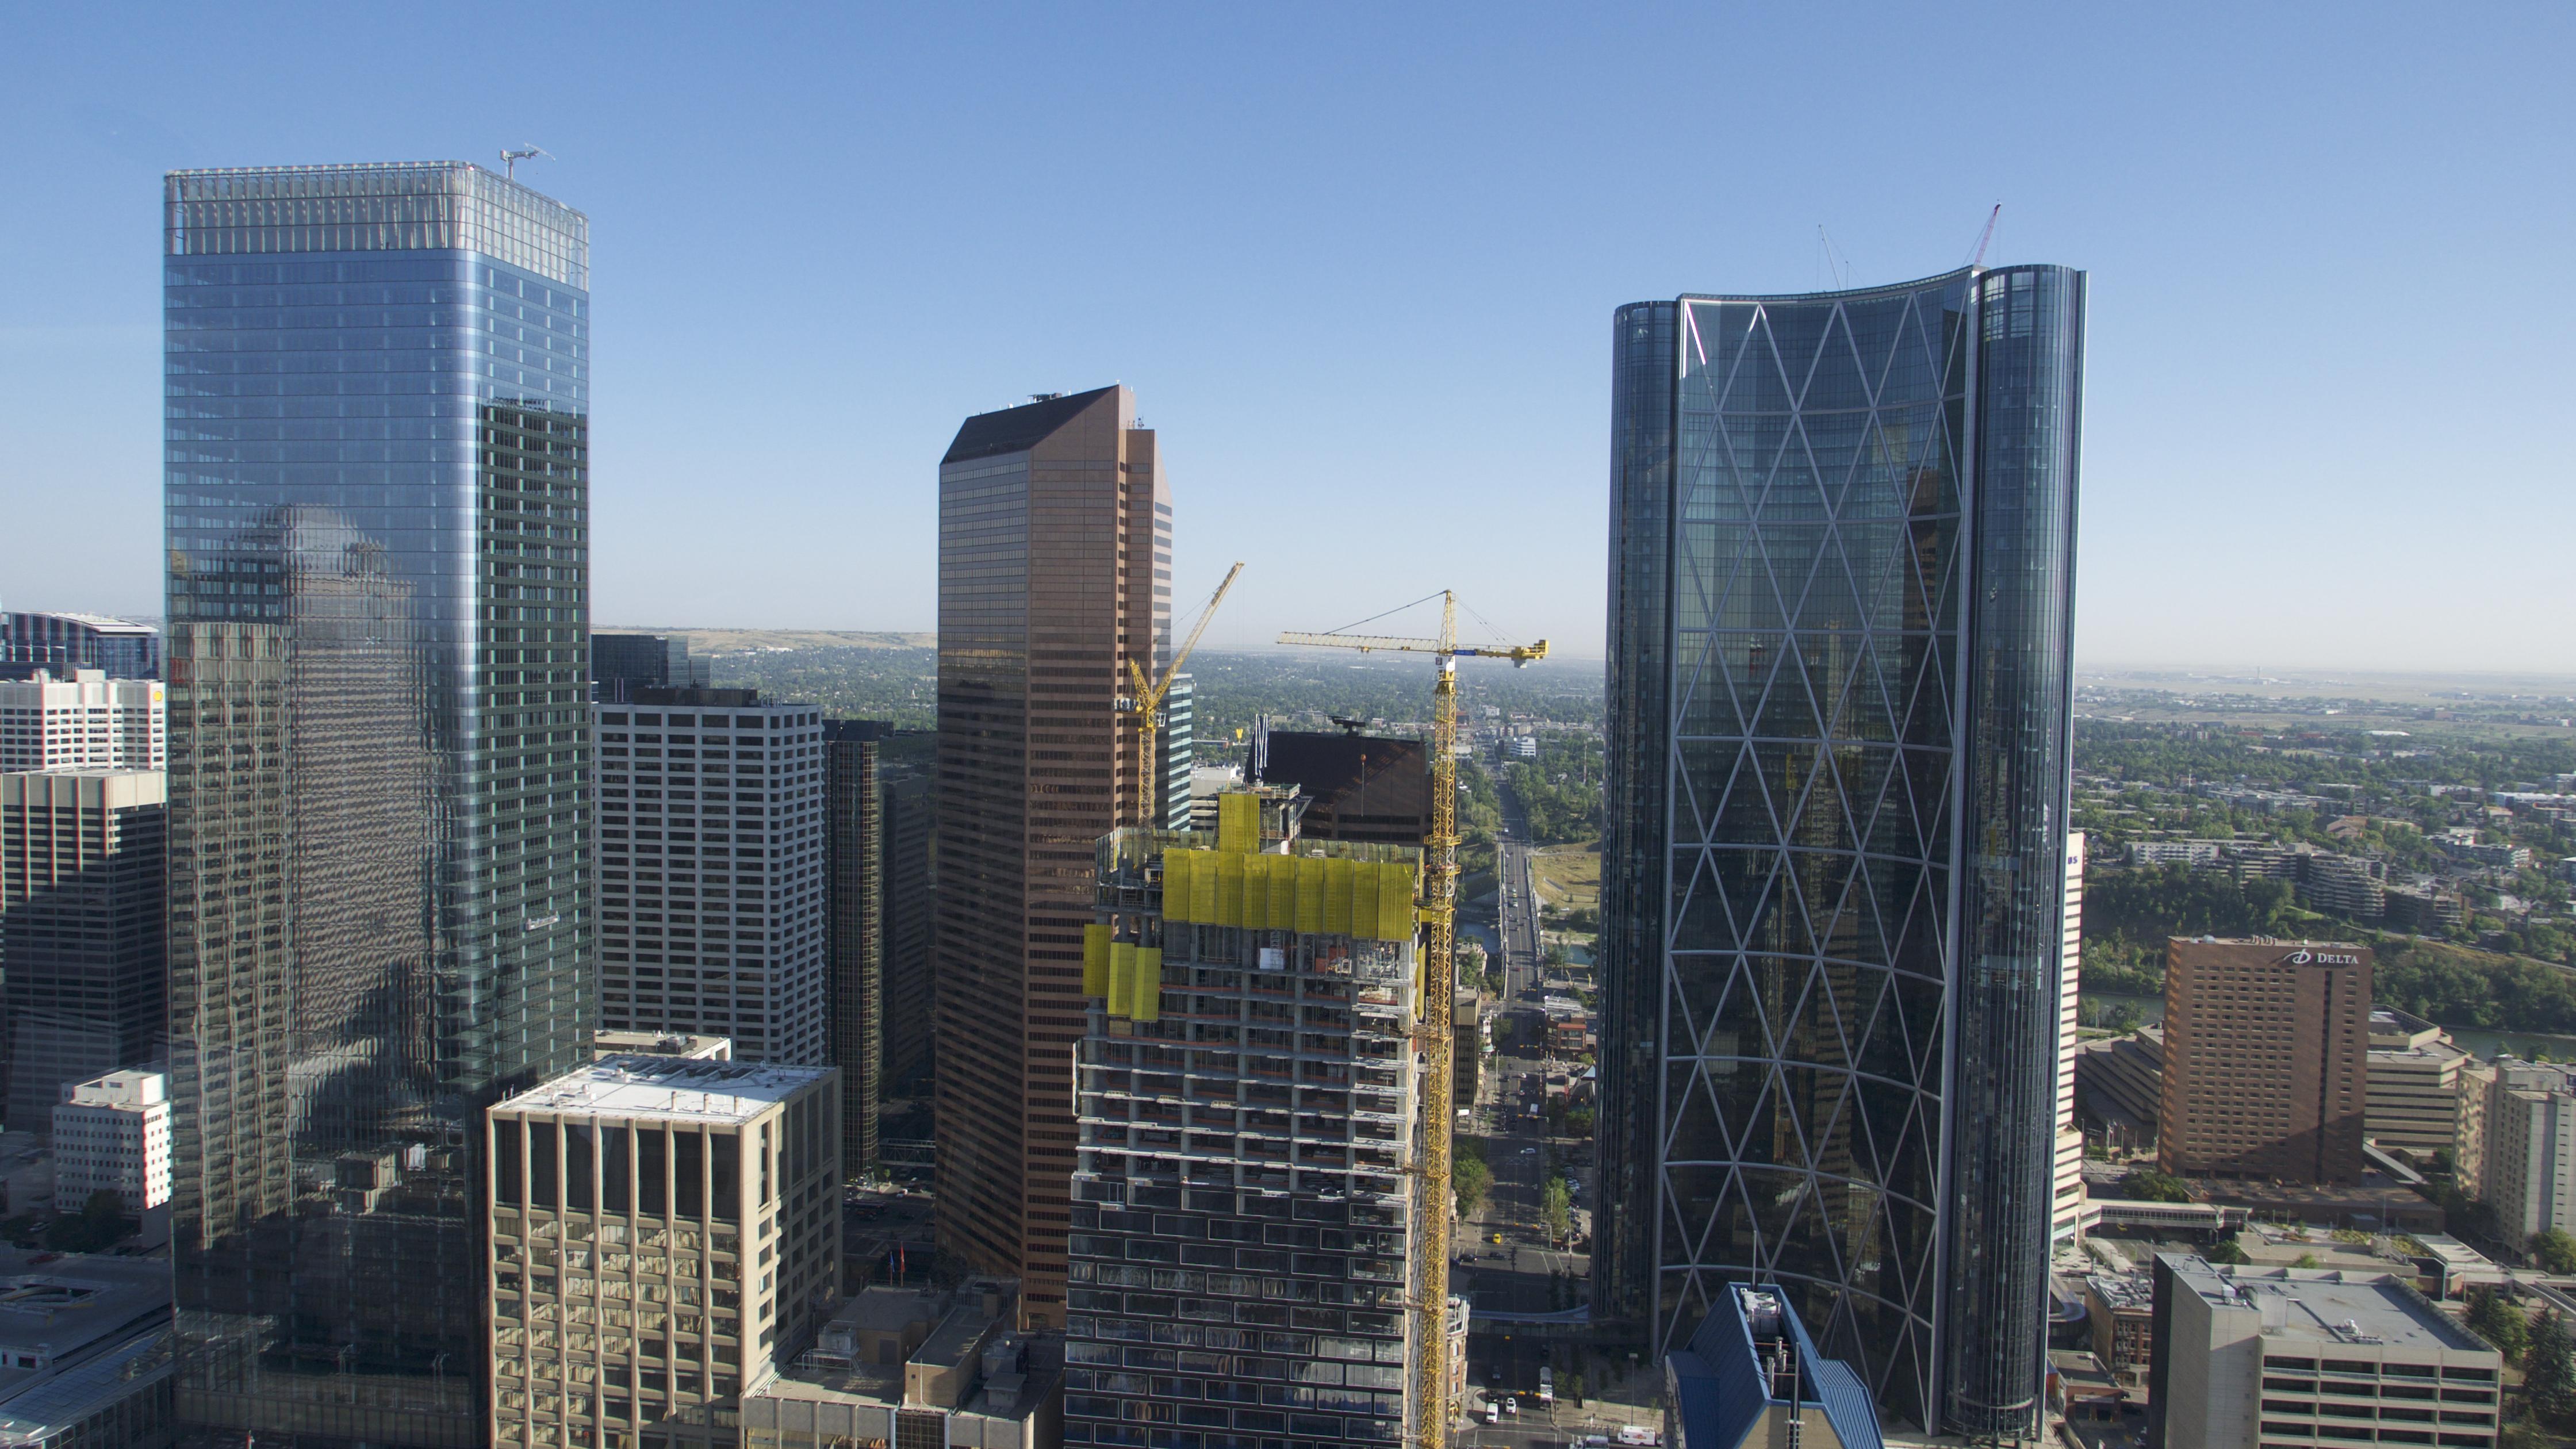 Canada Calgary Downtown, Architecture, Building, Calgary, Canada, HQ Photo